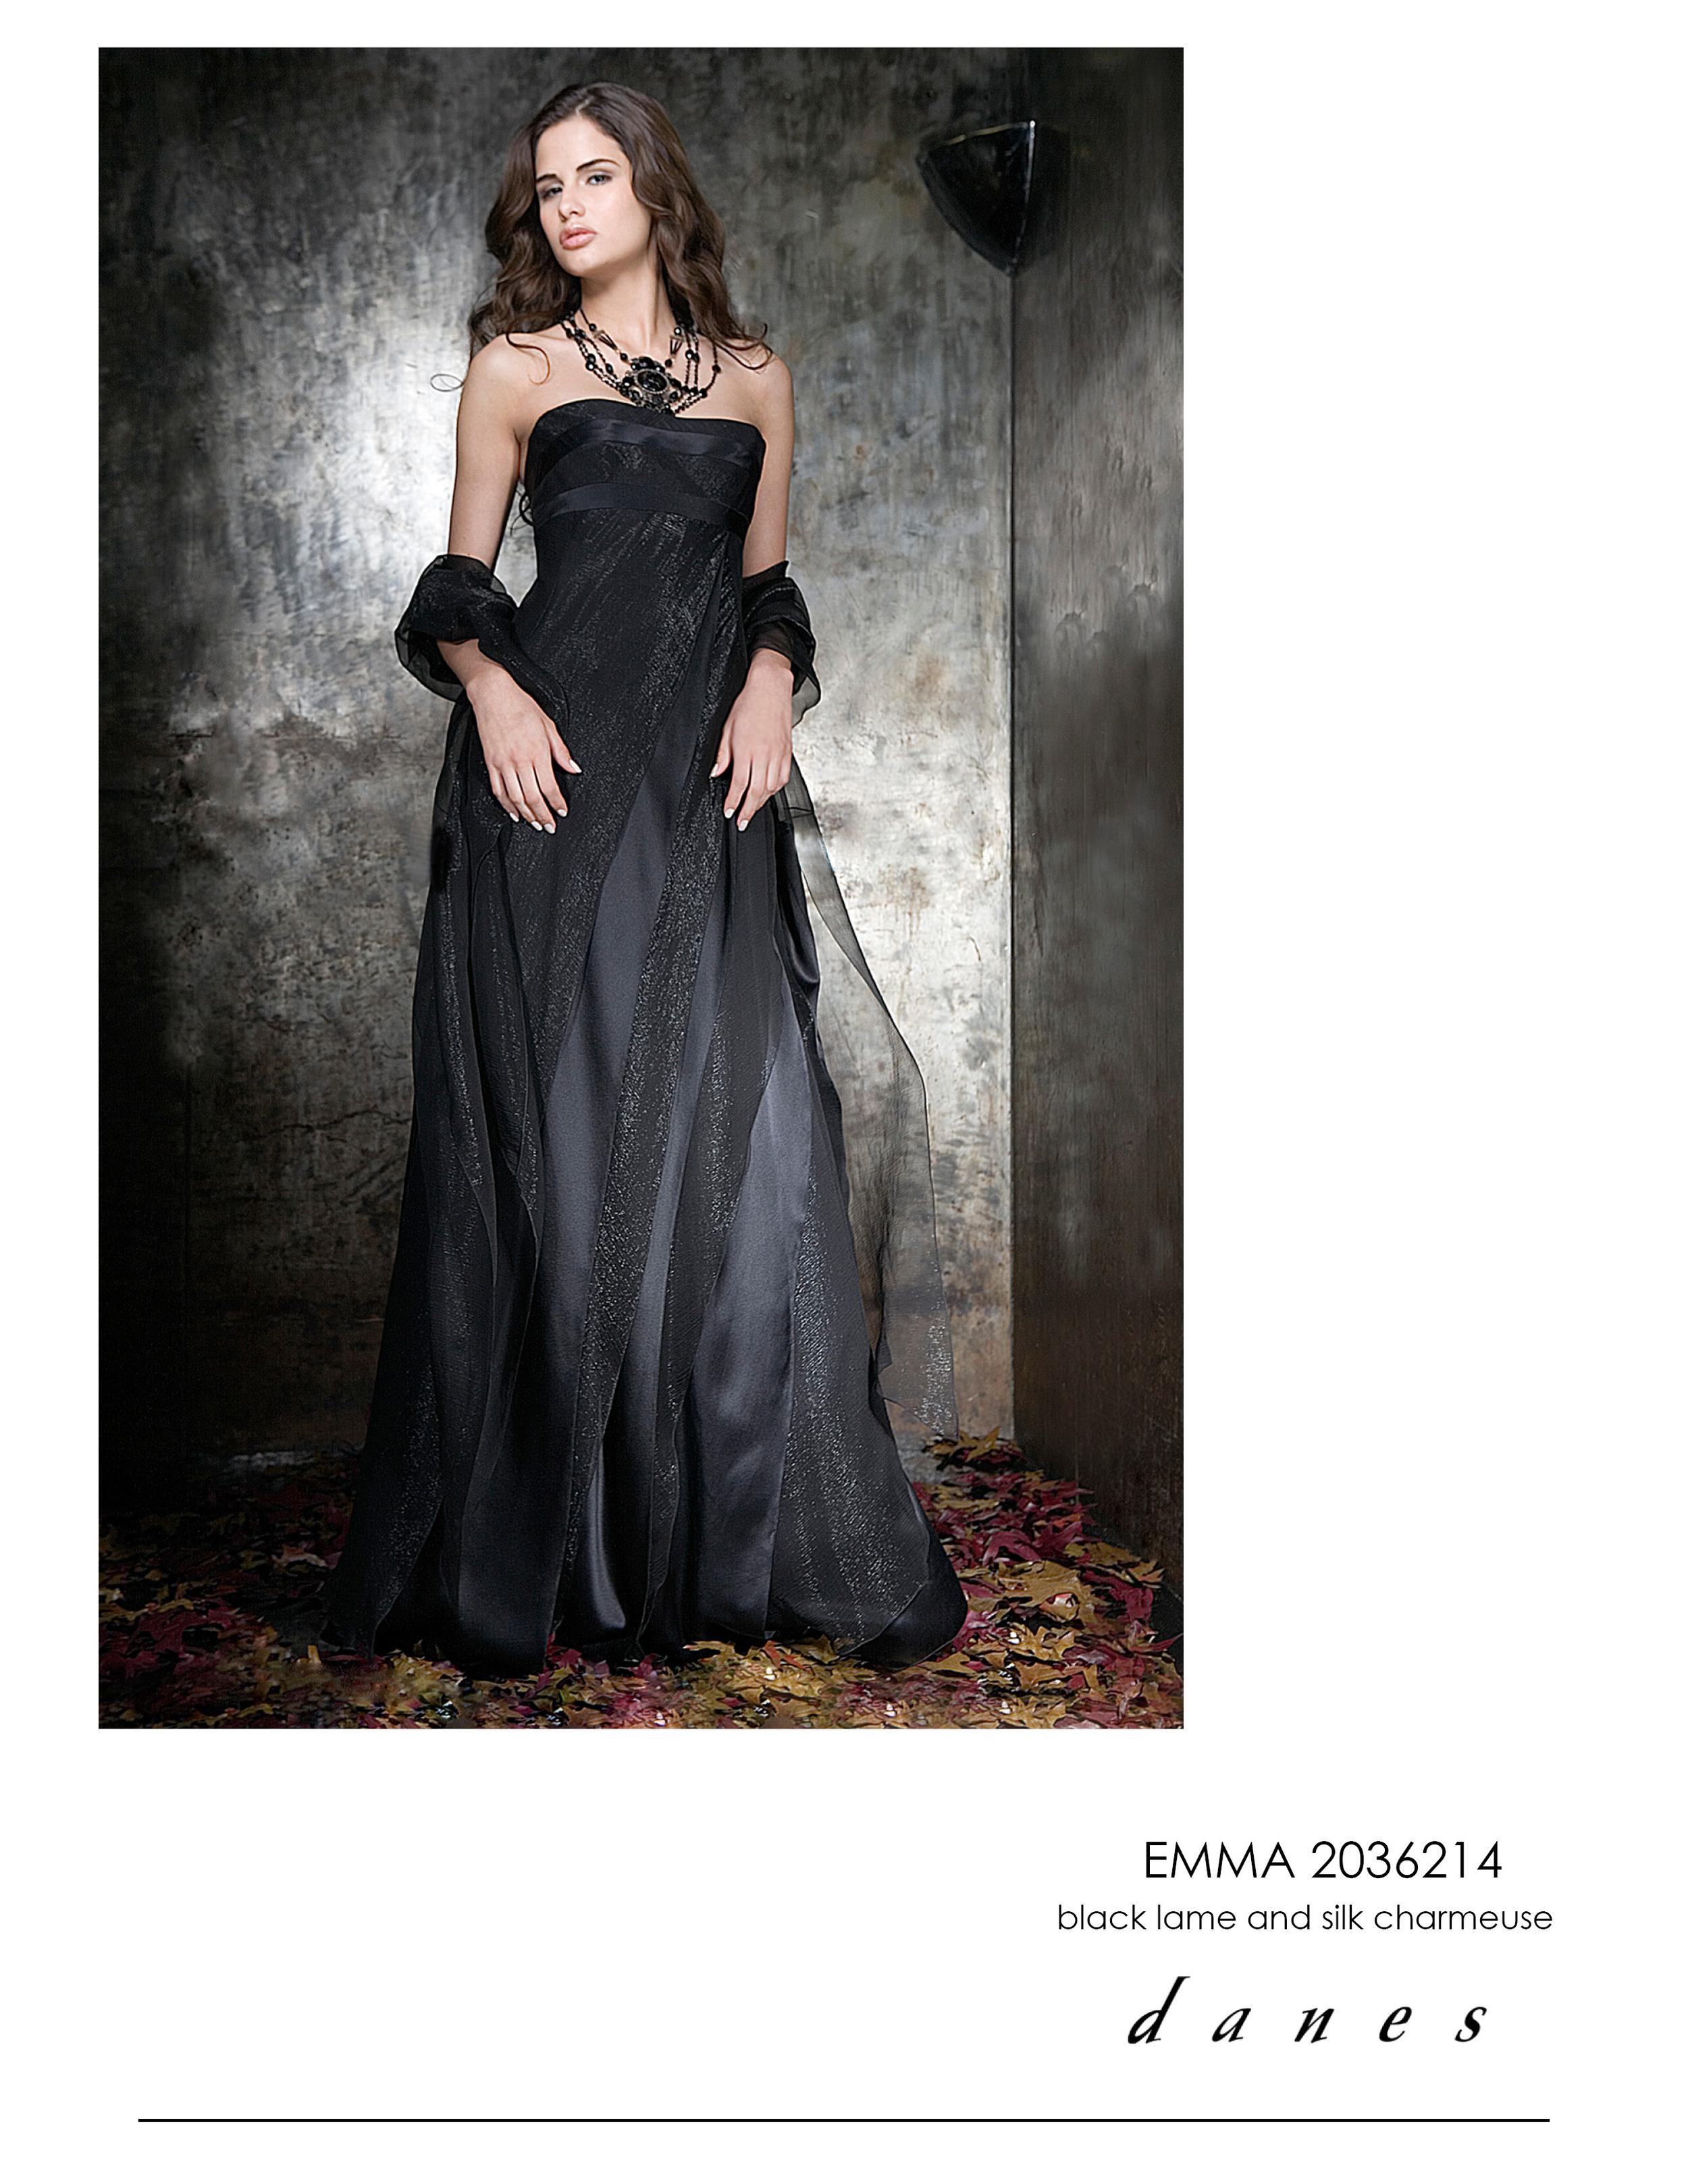 Emma Ind to JPG.jpg